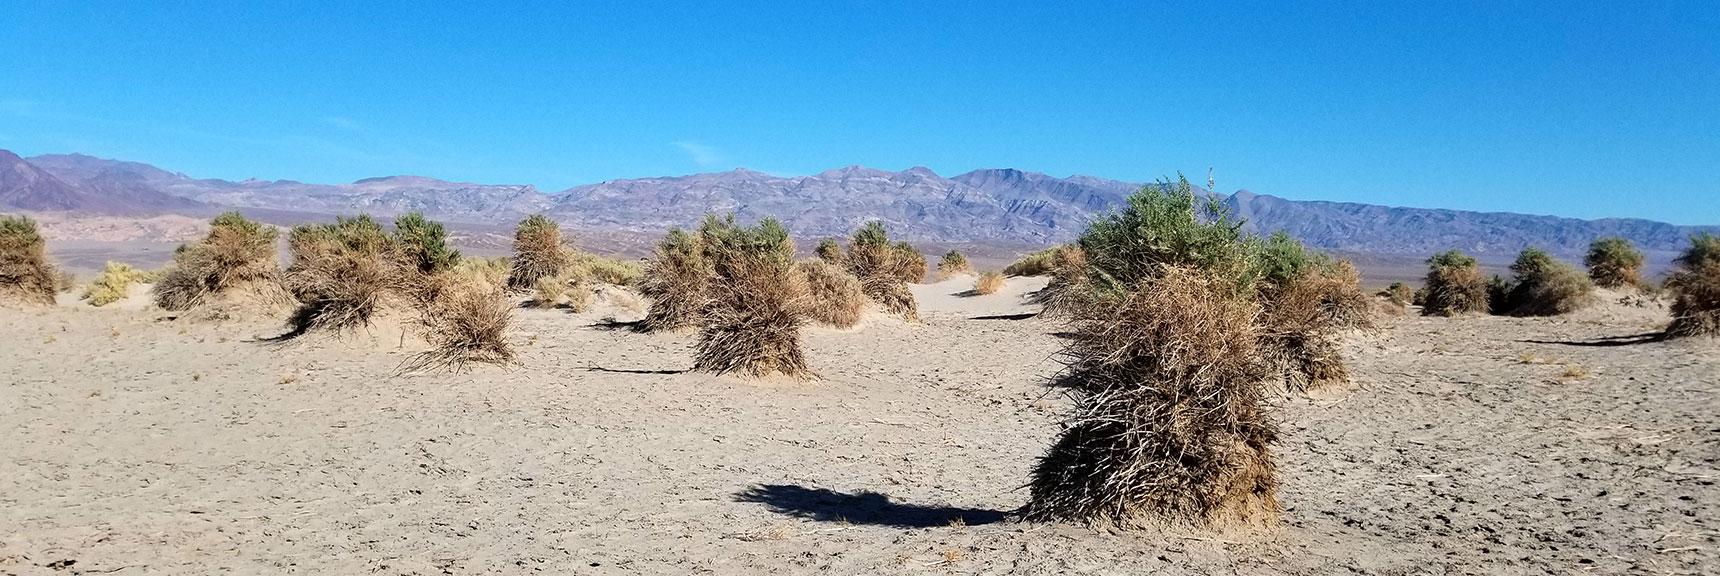 Death Valley National Park Devil's Cornfield November 24th 2018